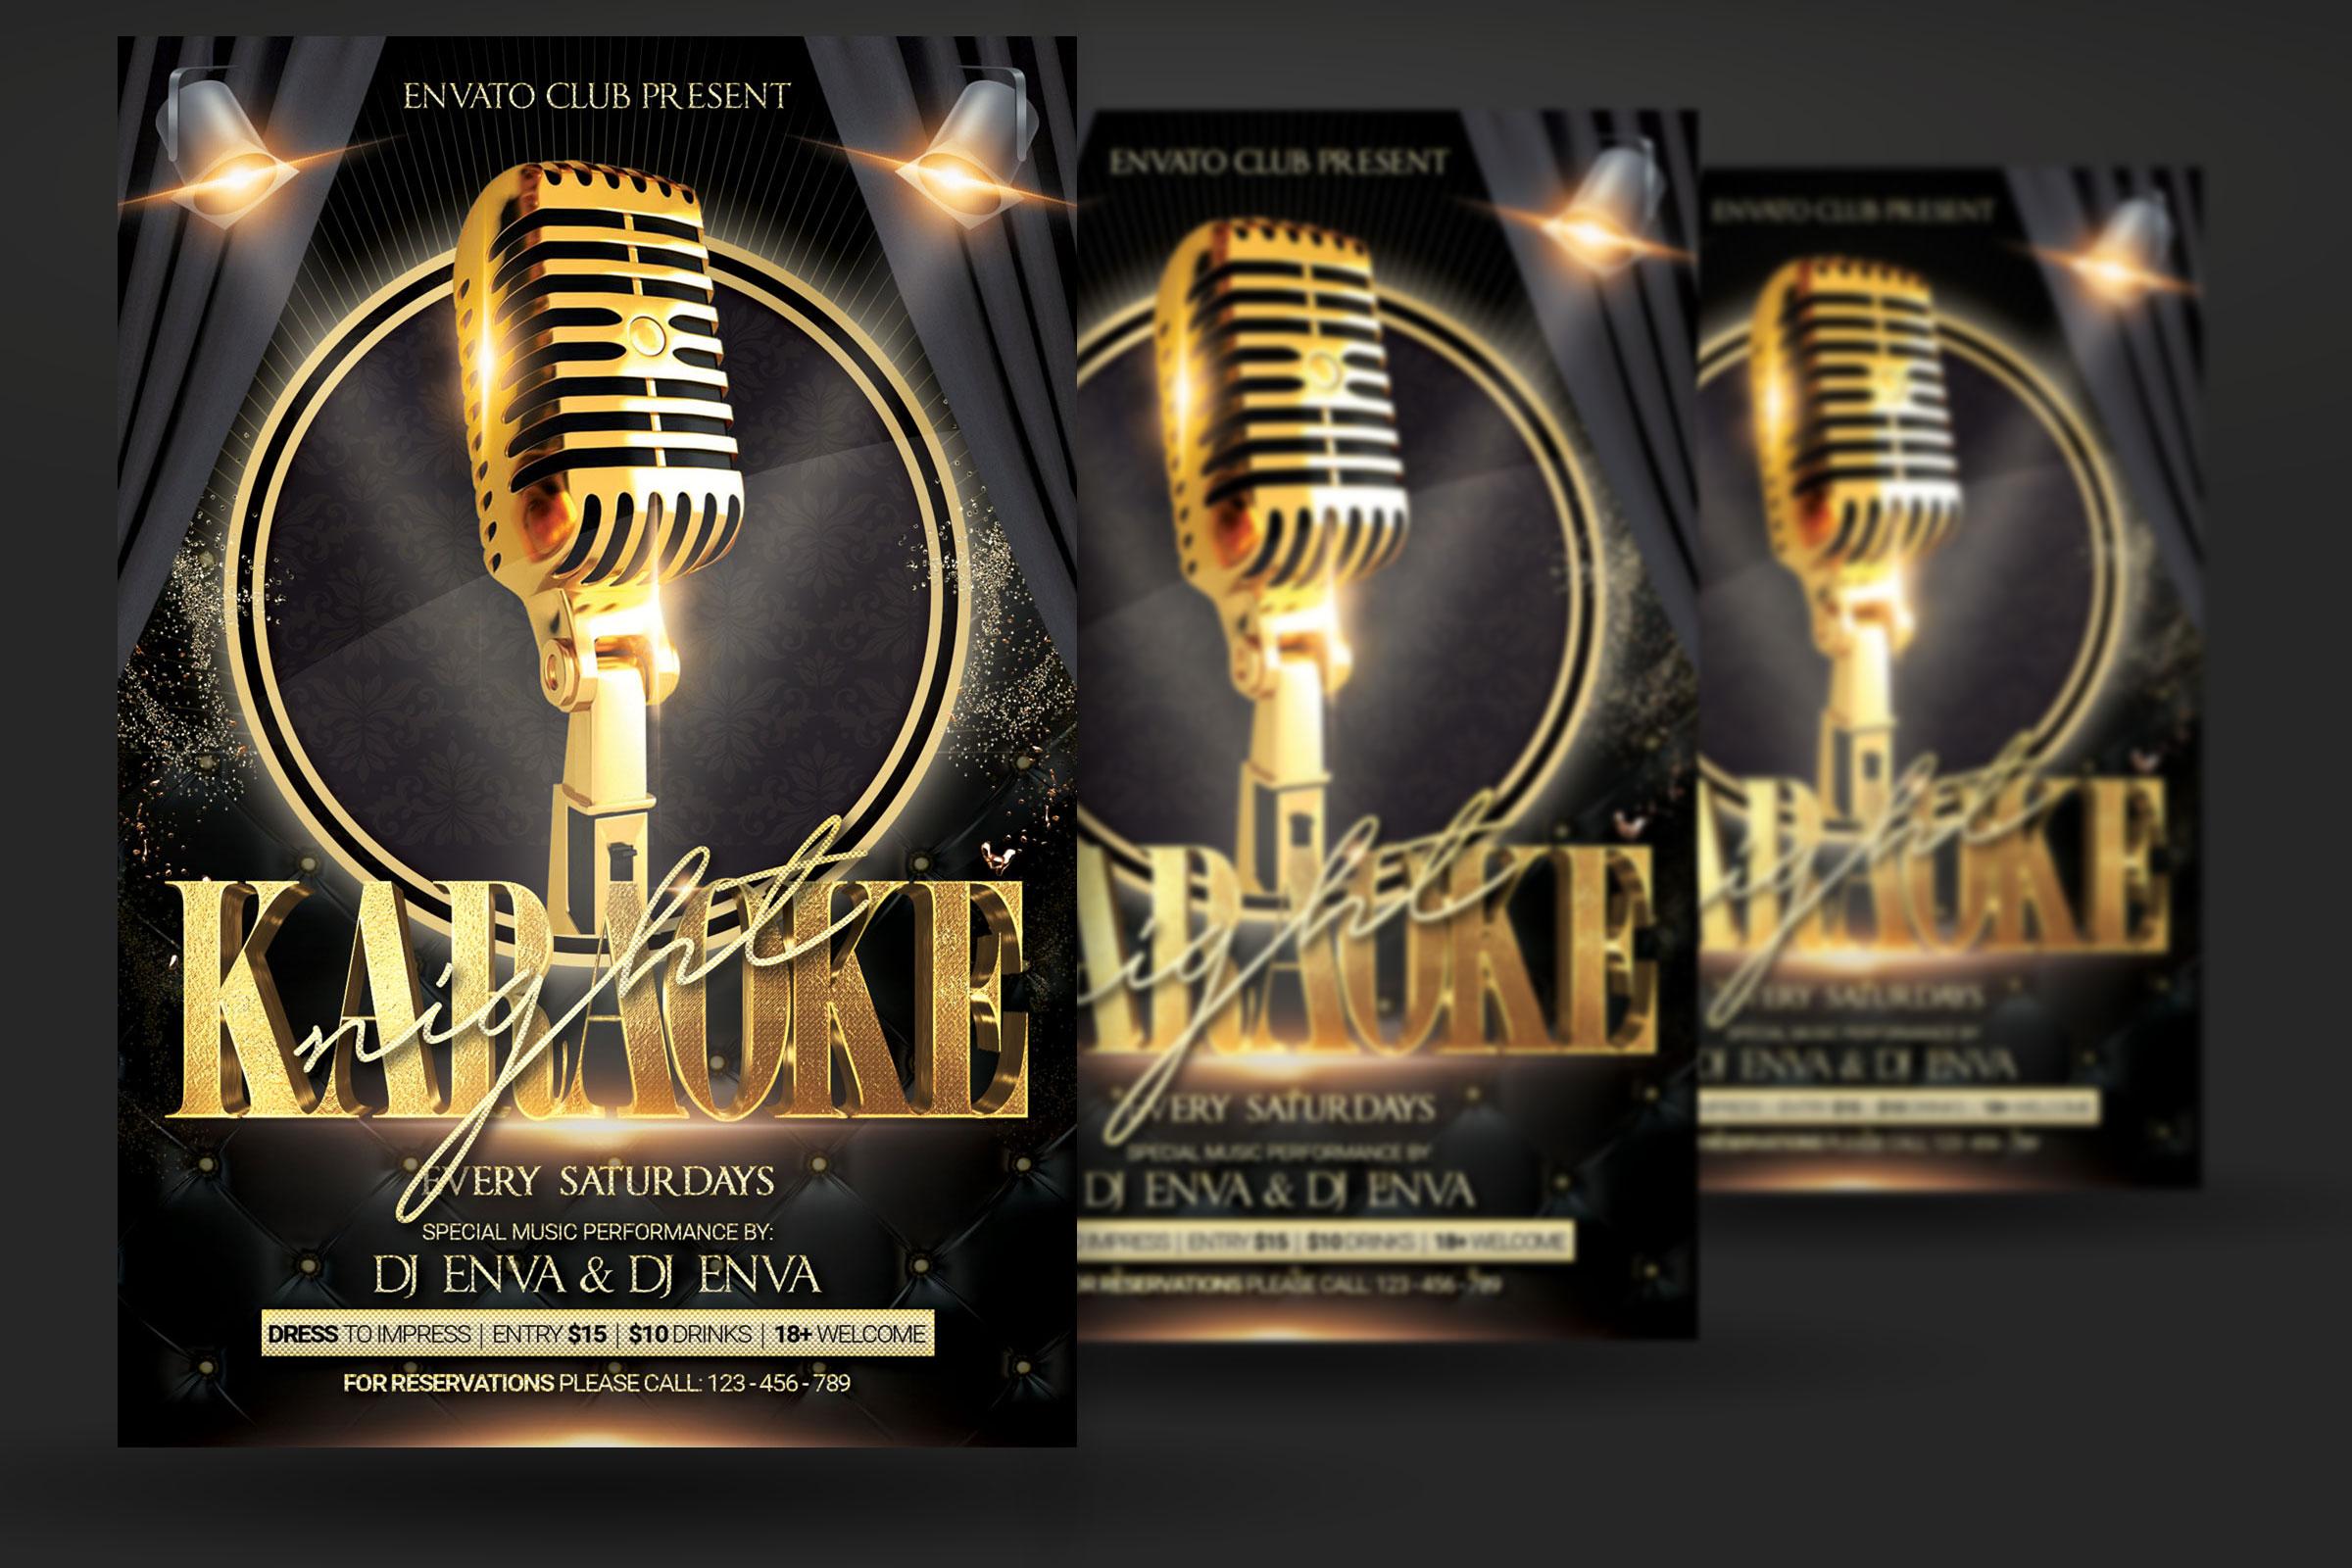 Karaoke Night Party Flyer example image 2